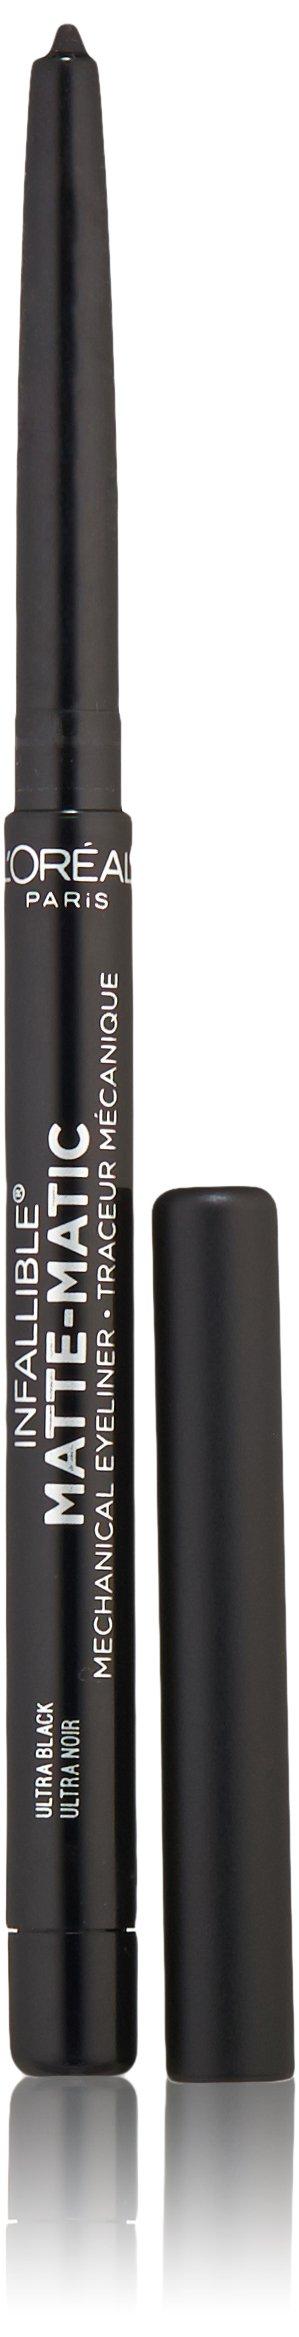 L'Oréal Paris Infallible Matte-Matic Mechanical Eyeliner, Ultra Black, 0.01 oz. (Packaging May Vary)